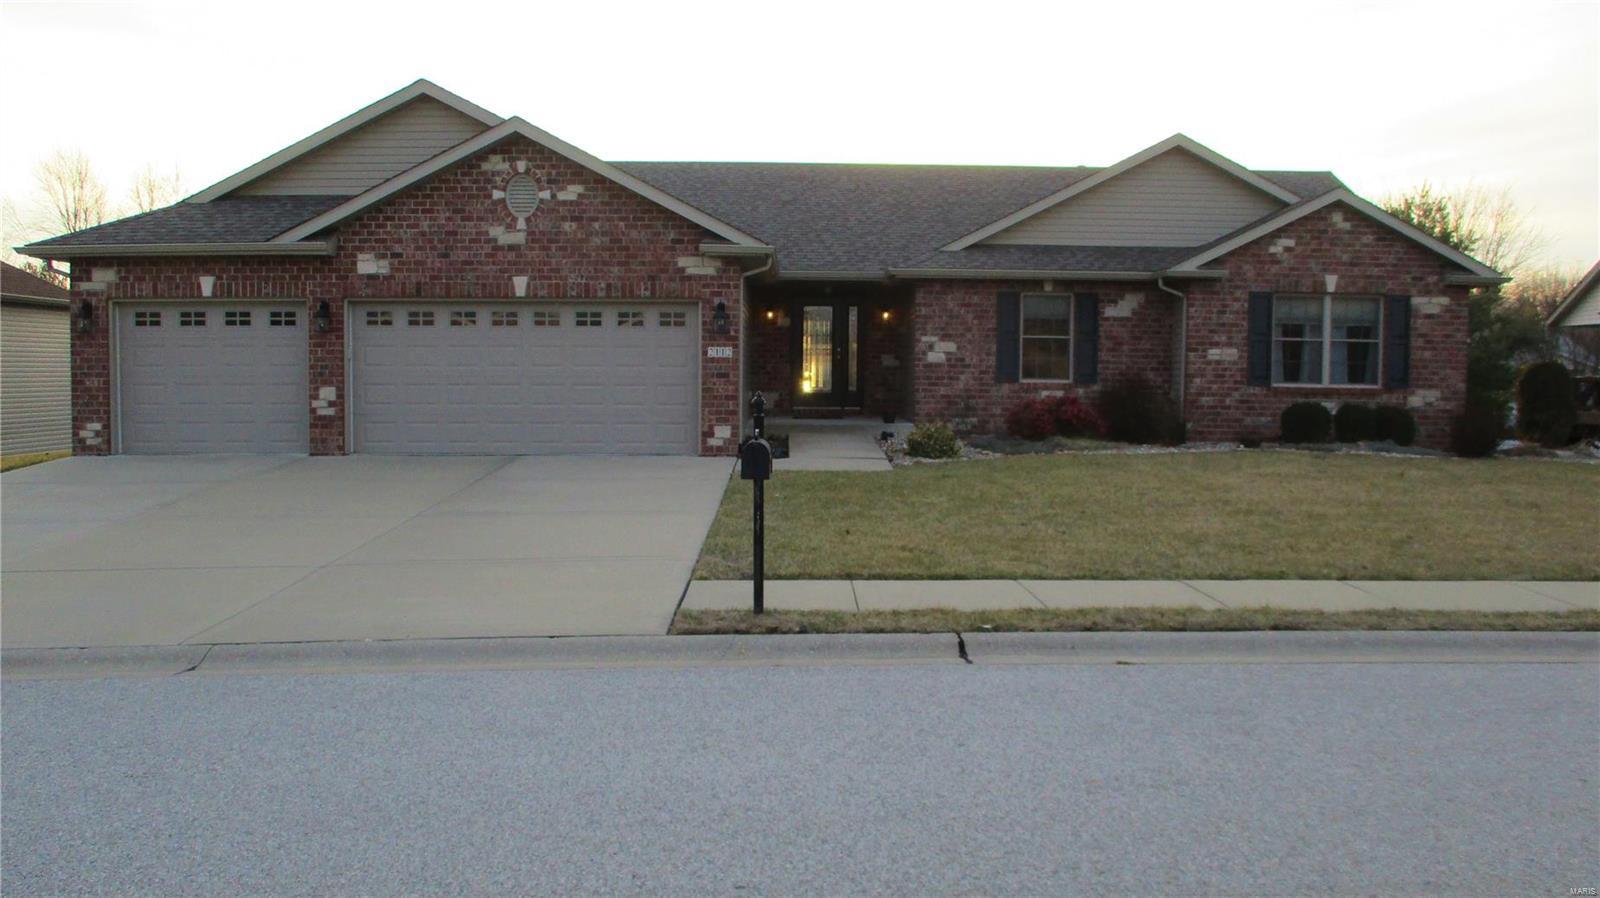 2112 Tuscany Ridge Court Property Photo - Maryville, IL real estate listing